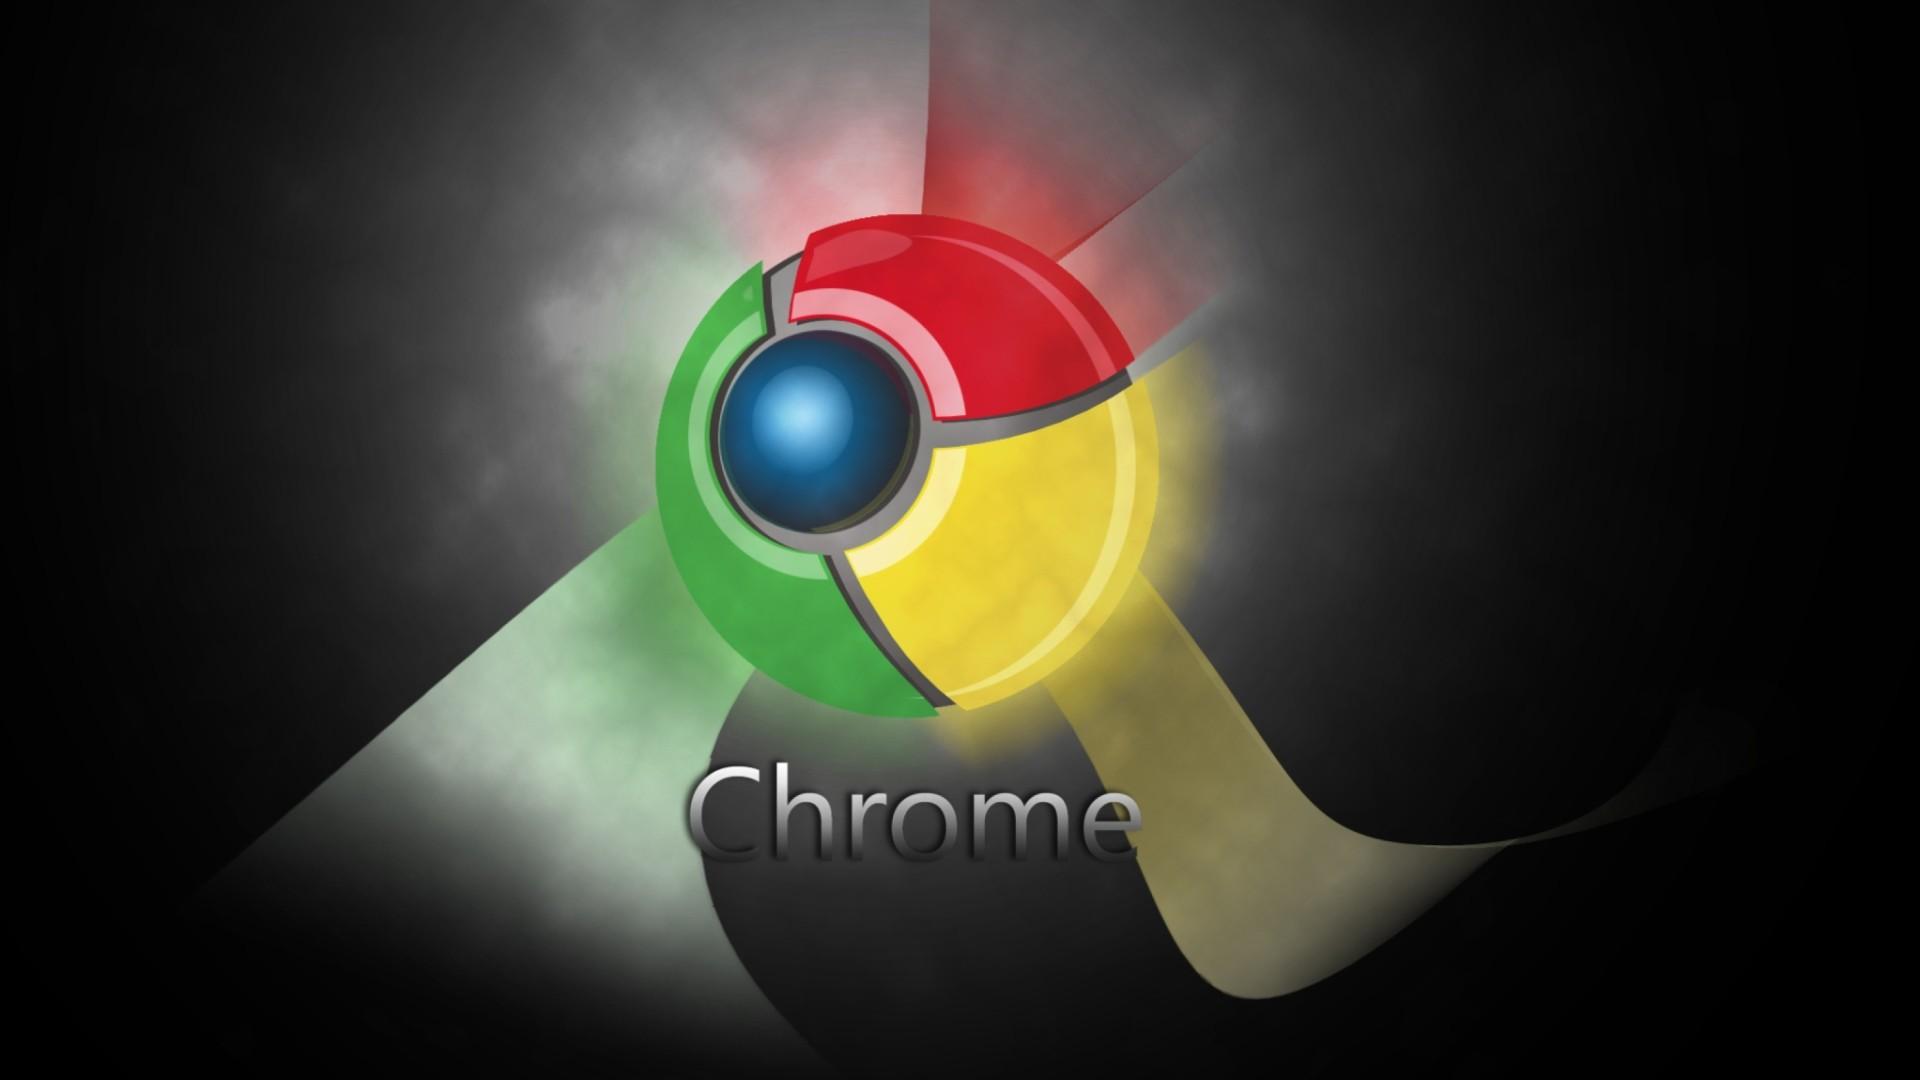 Chrome Desktop Wallpaper